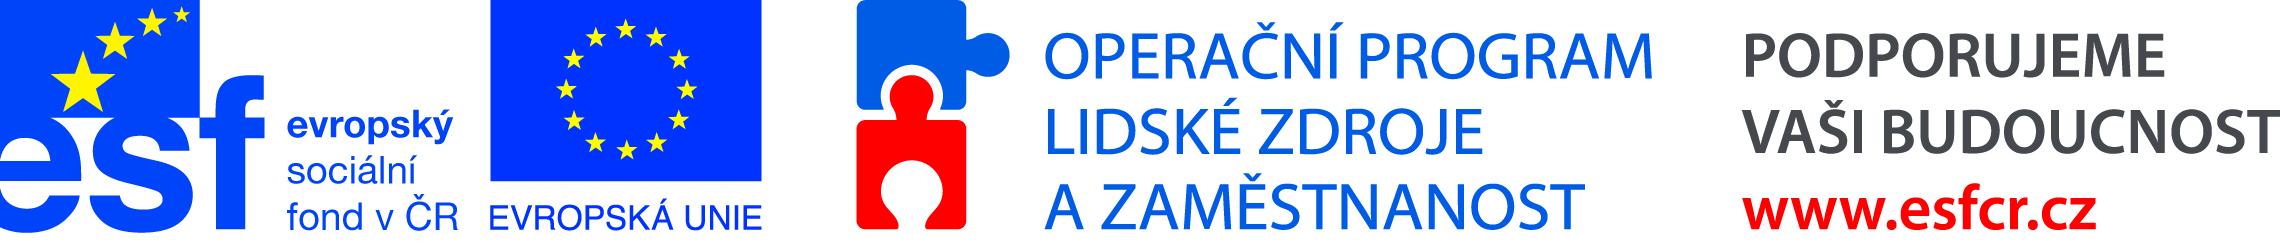 esf_eu_oplzz_podporujeme_horizontal_cmyk_3.jpg